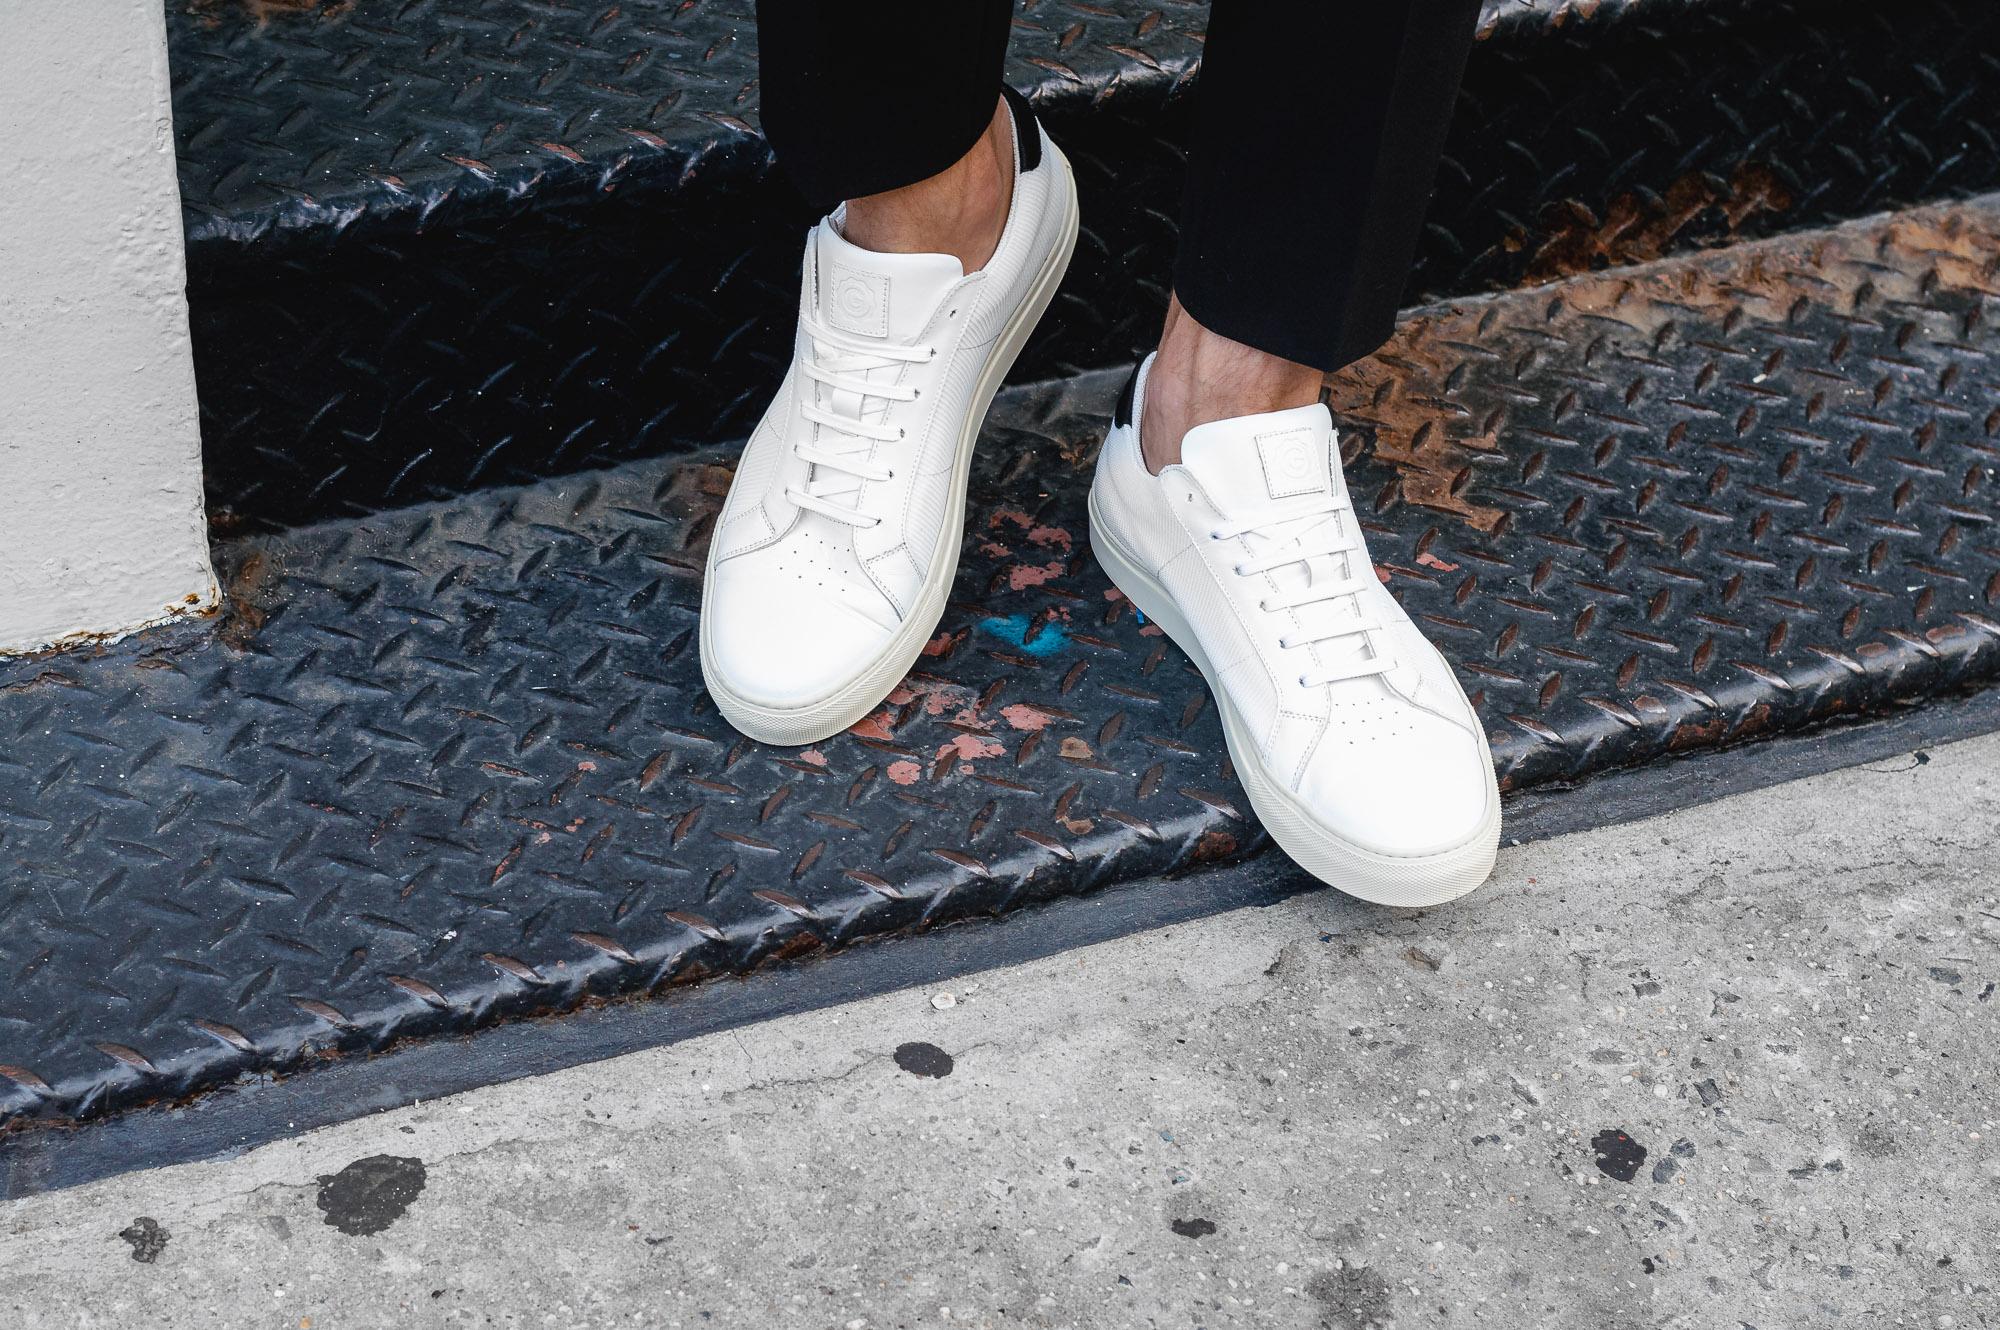 greats royale vintage sneaker